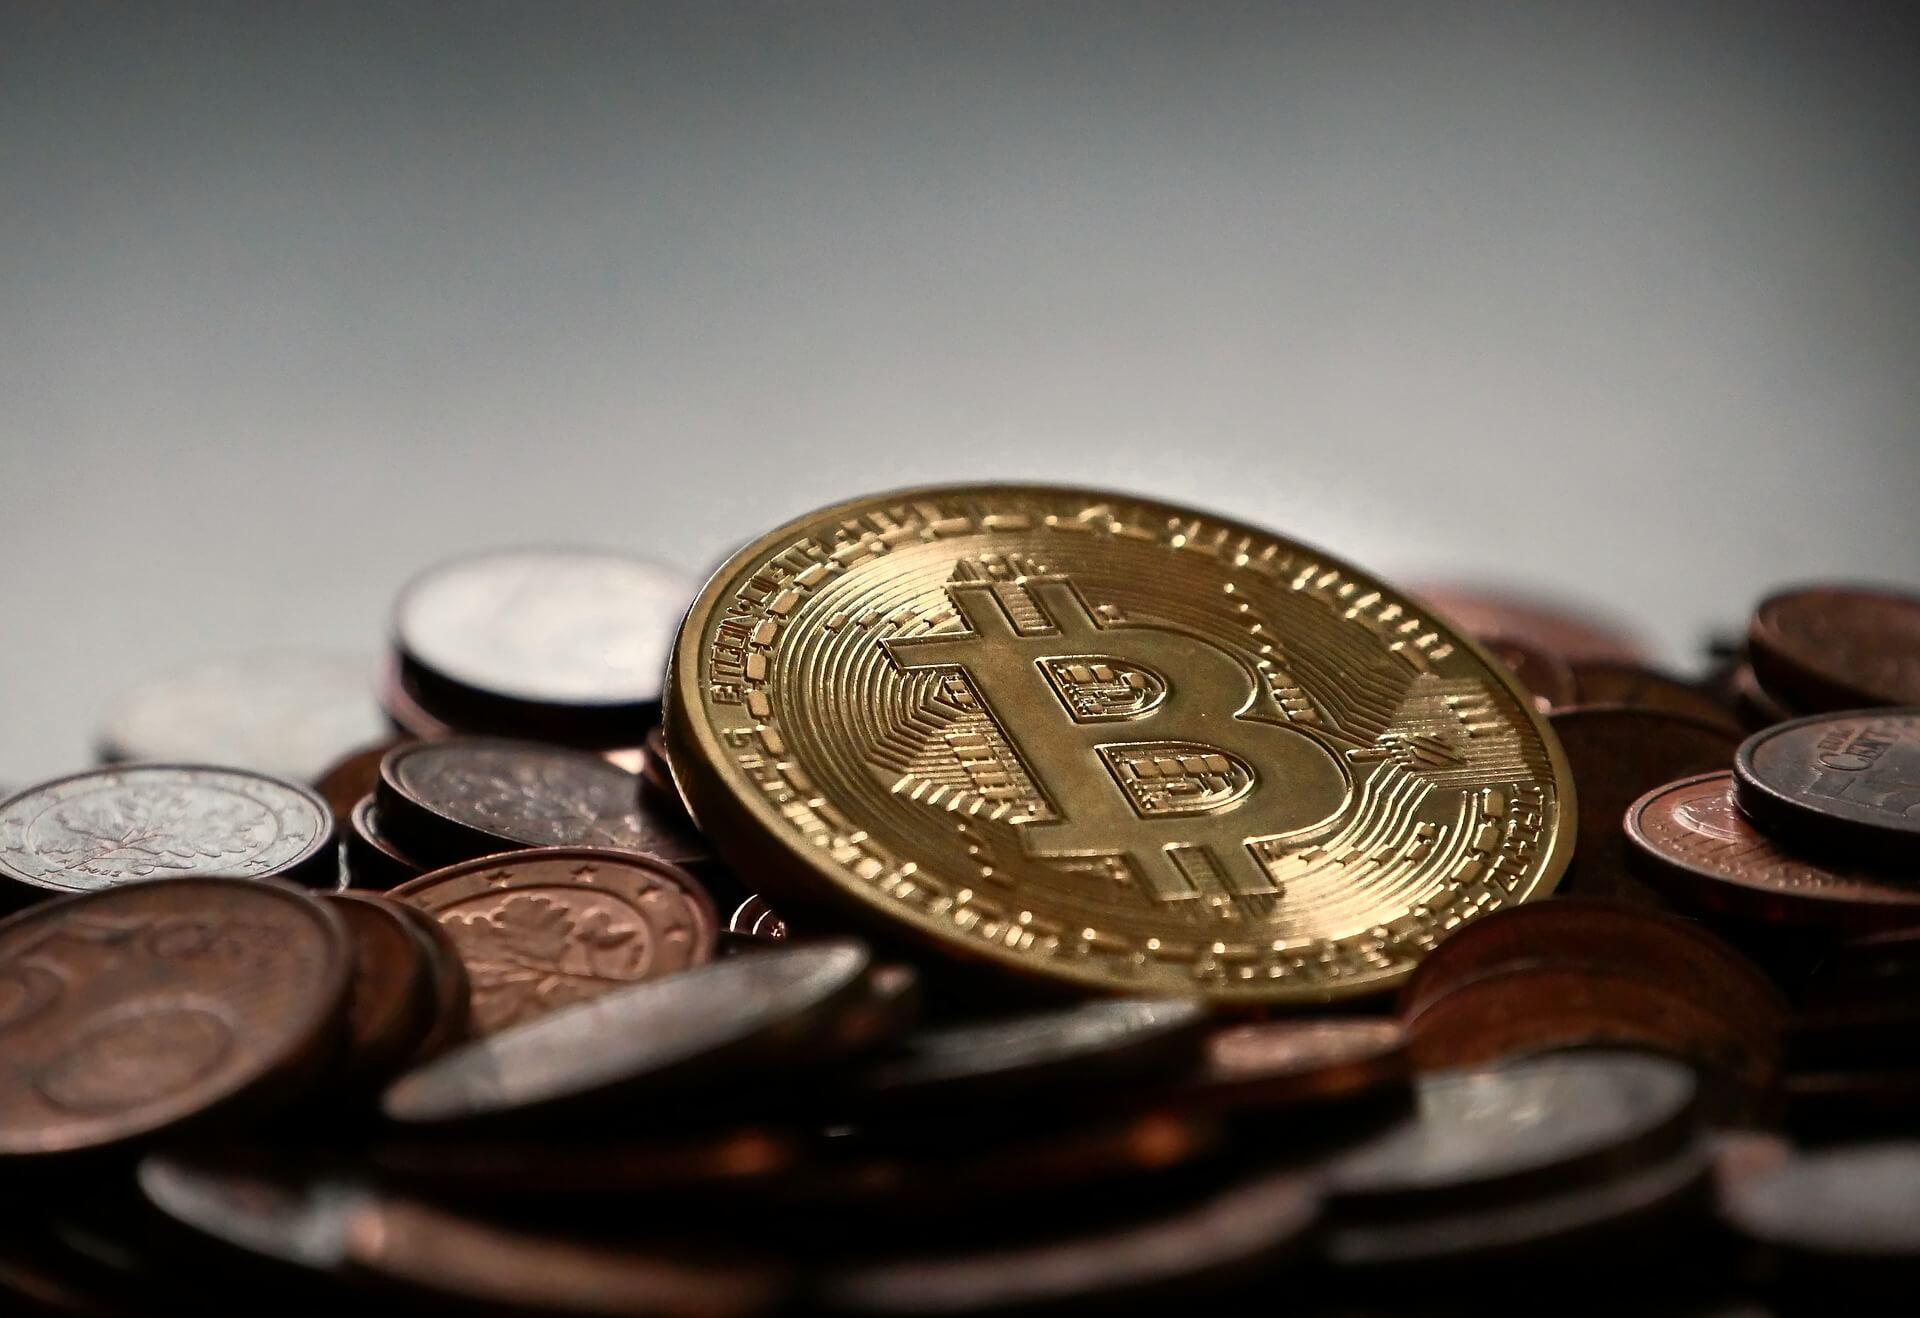 bitkoinai veda